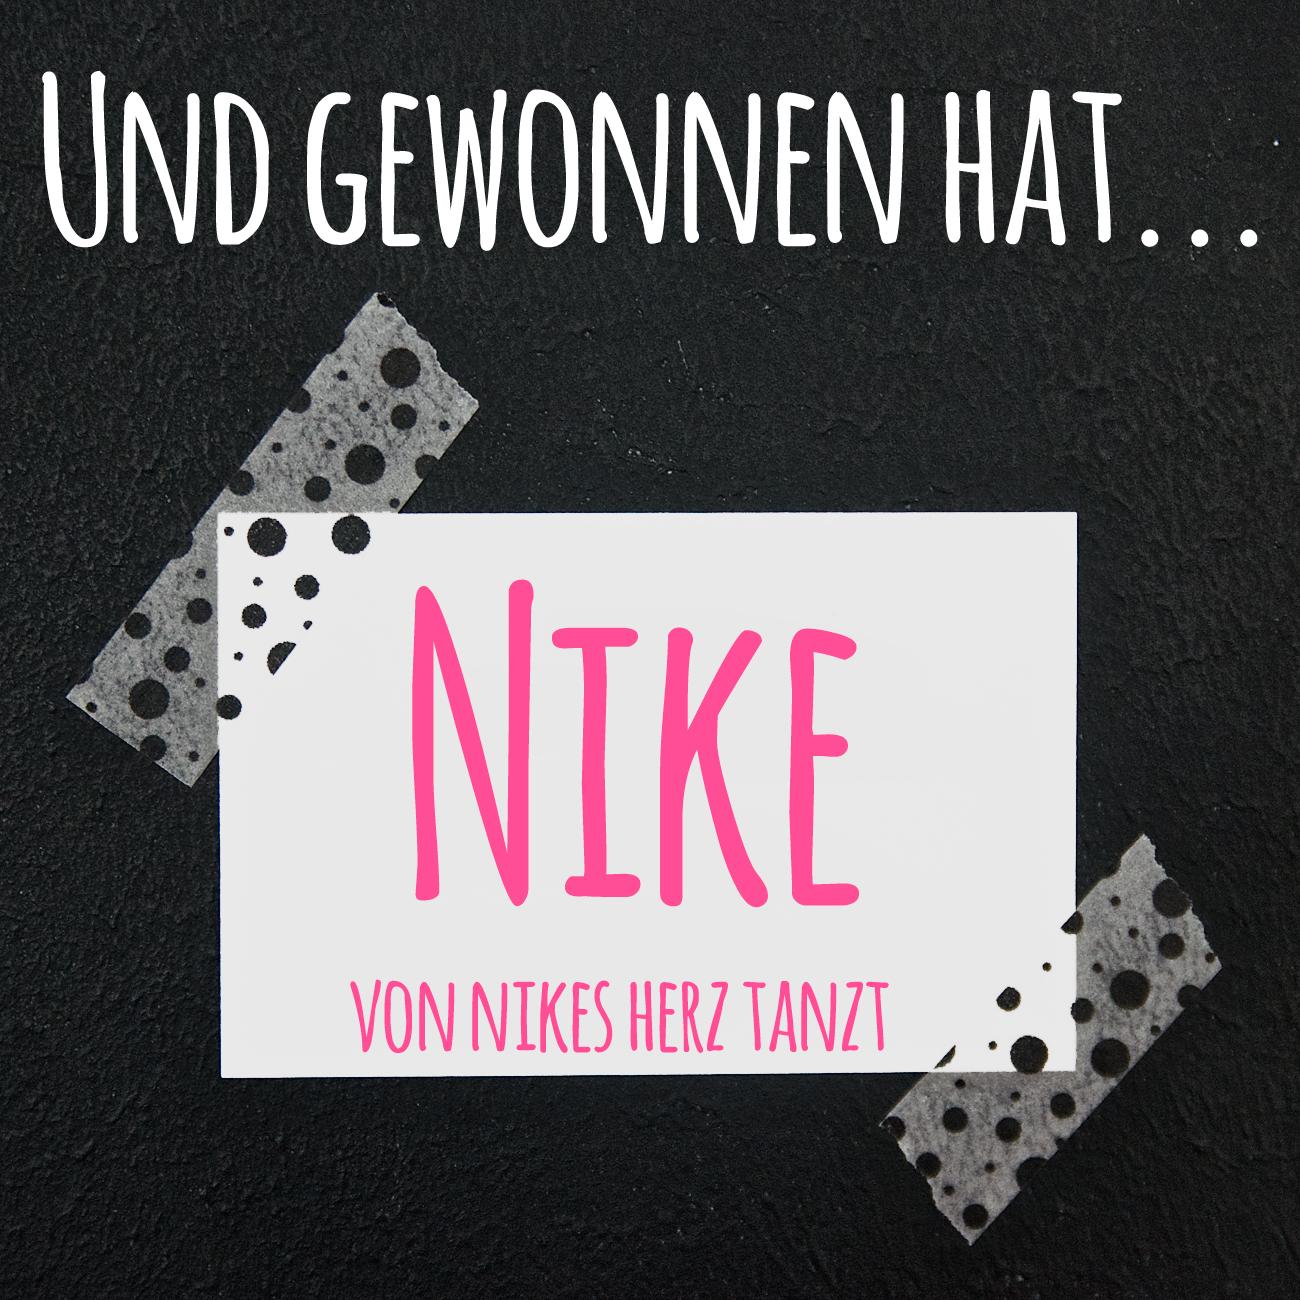 Moo Busniness Cards Giveaway Winner Nike von nikes herz tanzt Pinkepank Blog